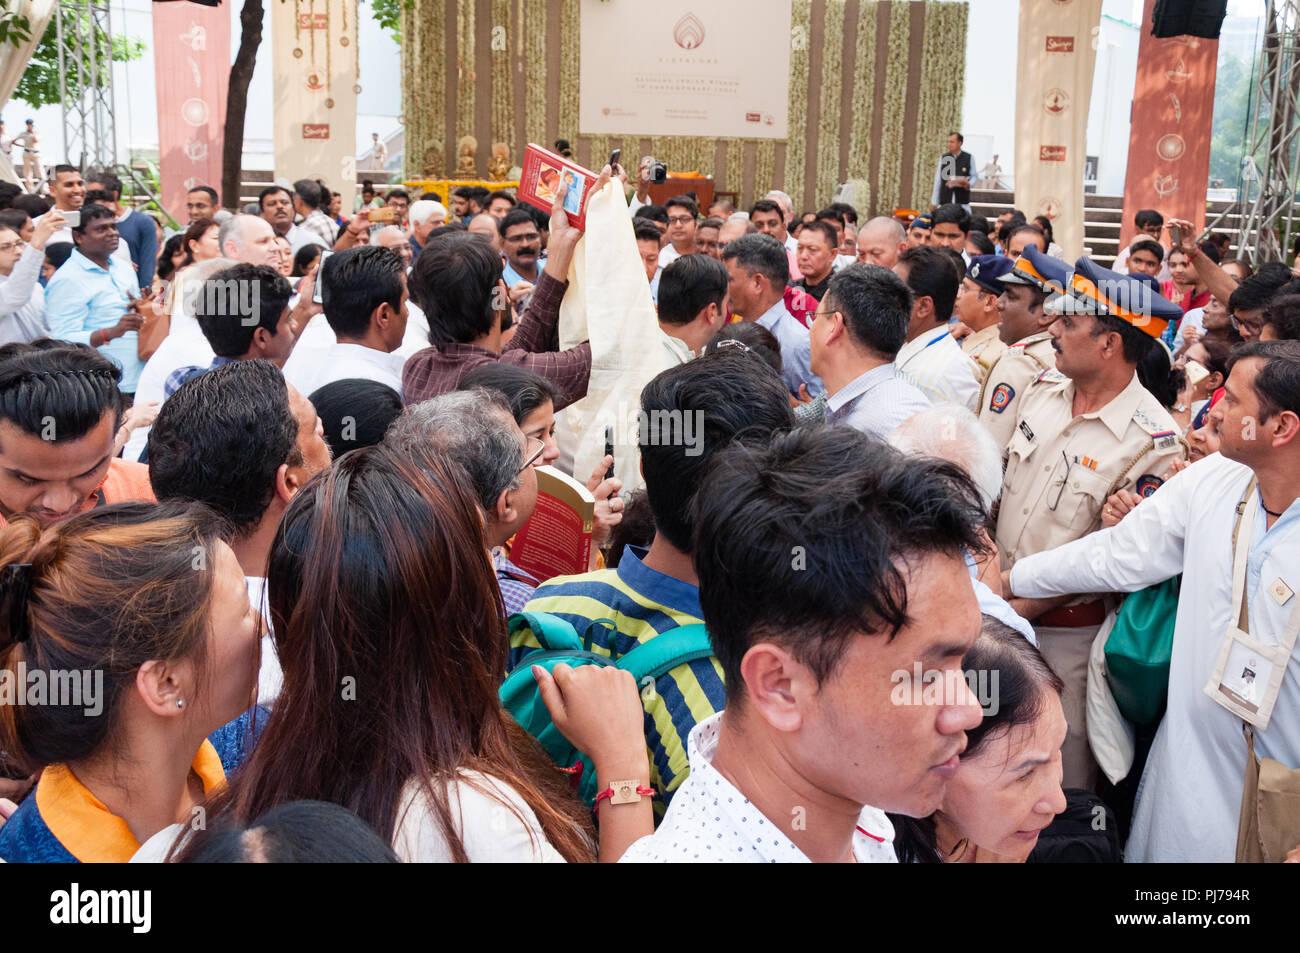 MUMBAI, INDIA – December 10 2017: Crowds jostling to see and photograph the Dalai Lama while policemen look on, as His Holiness the 14th Dalai Lama (B - Stock Image